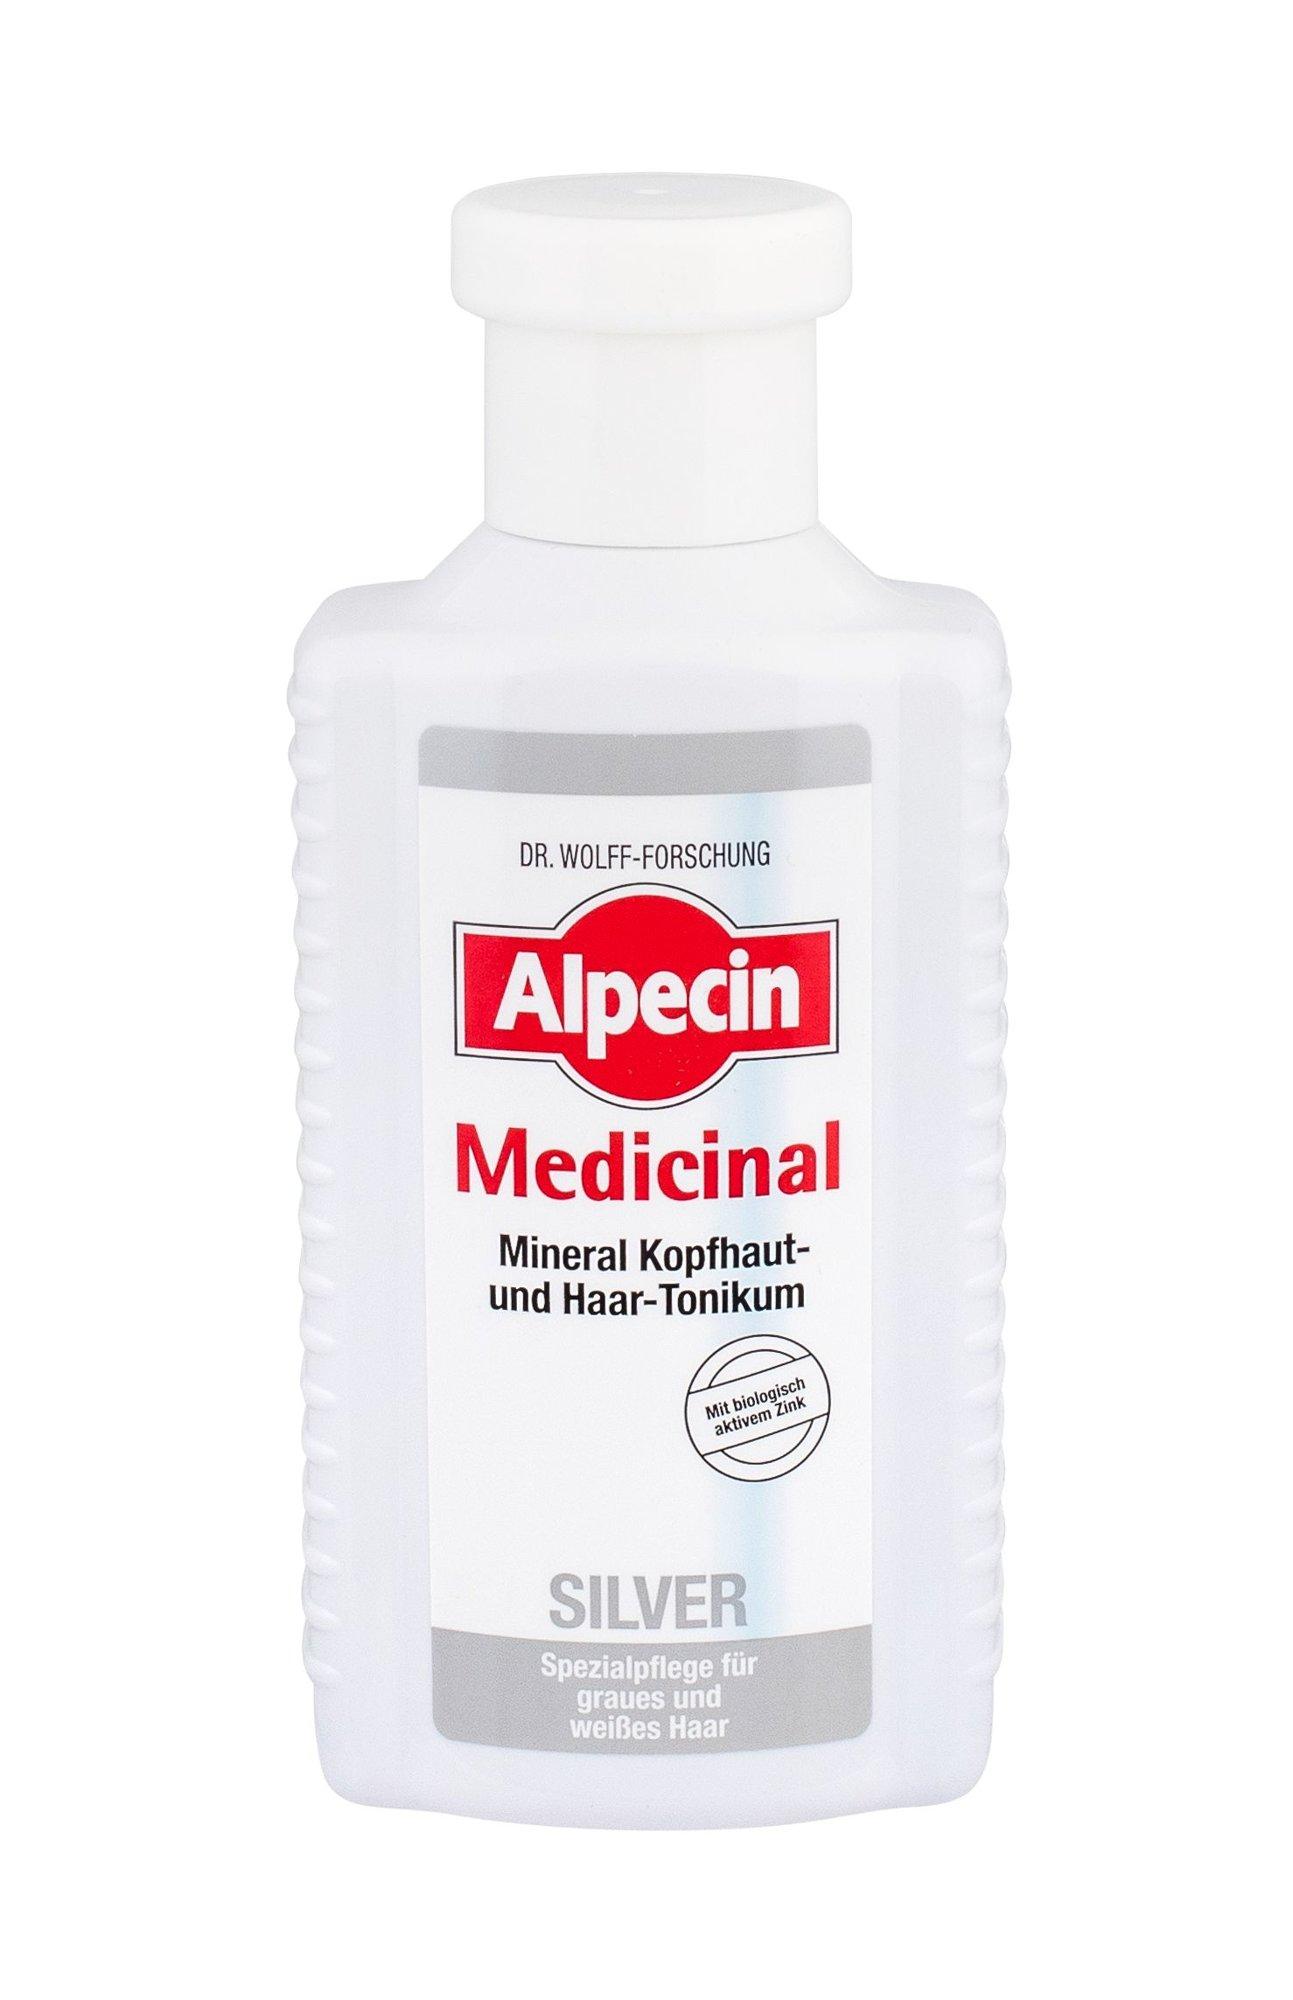 Alpecin Medicinal Silver Cosmetic 200ml